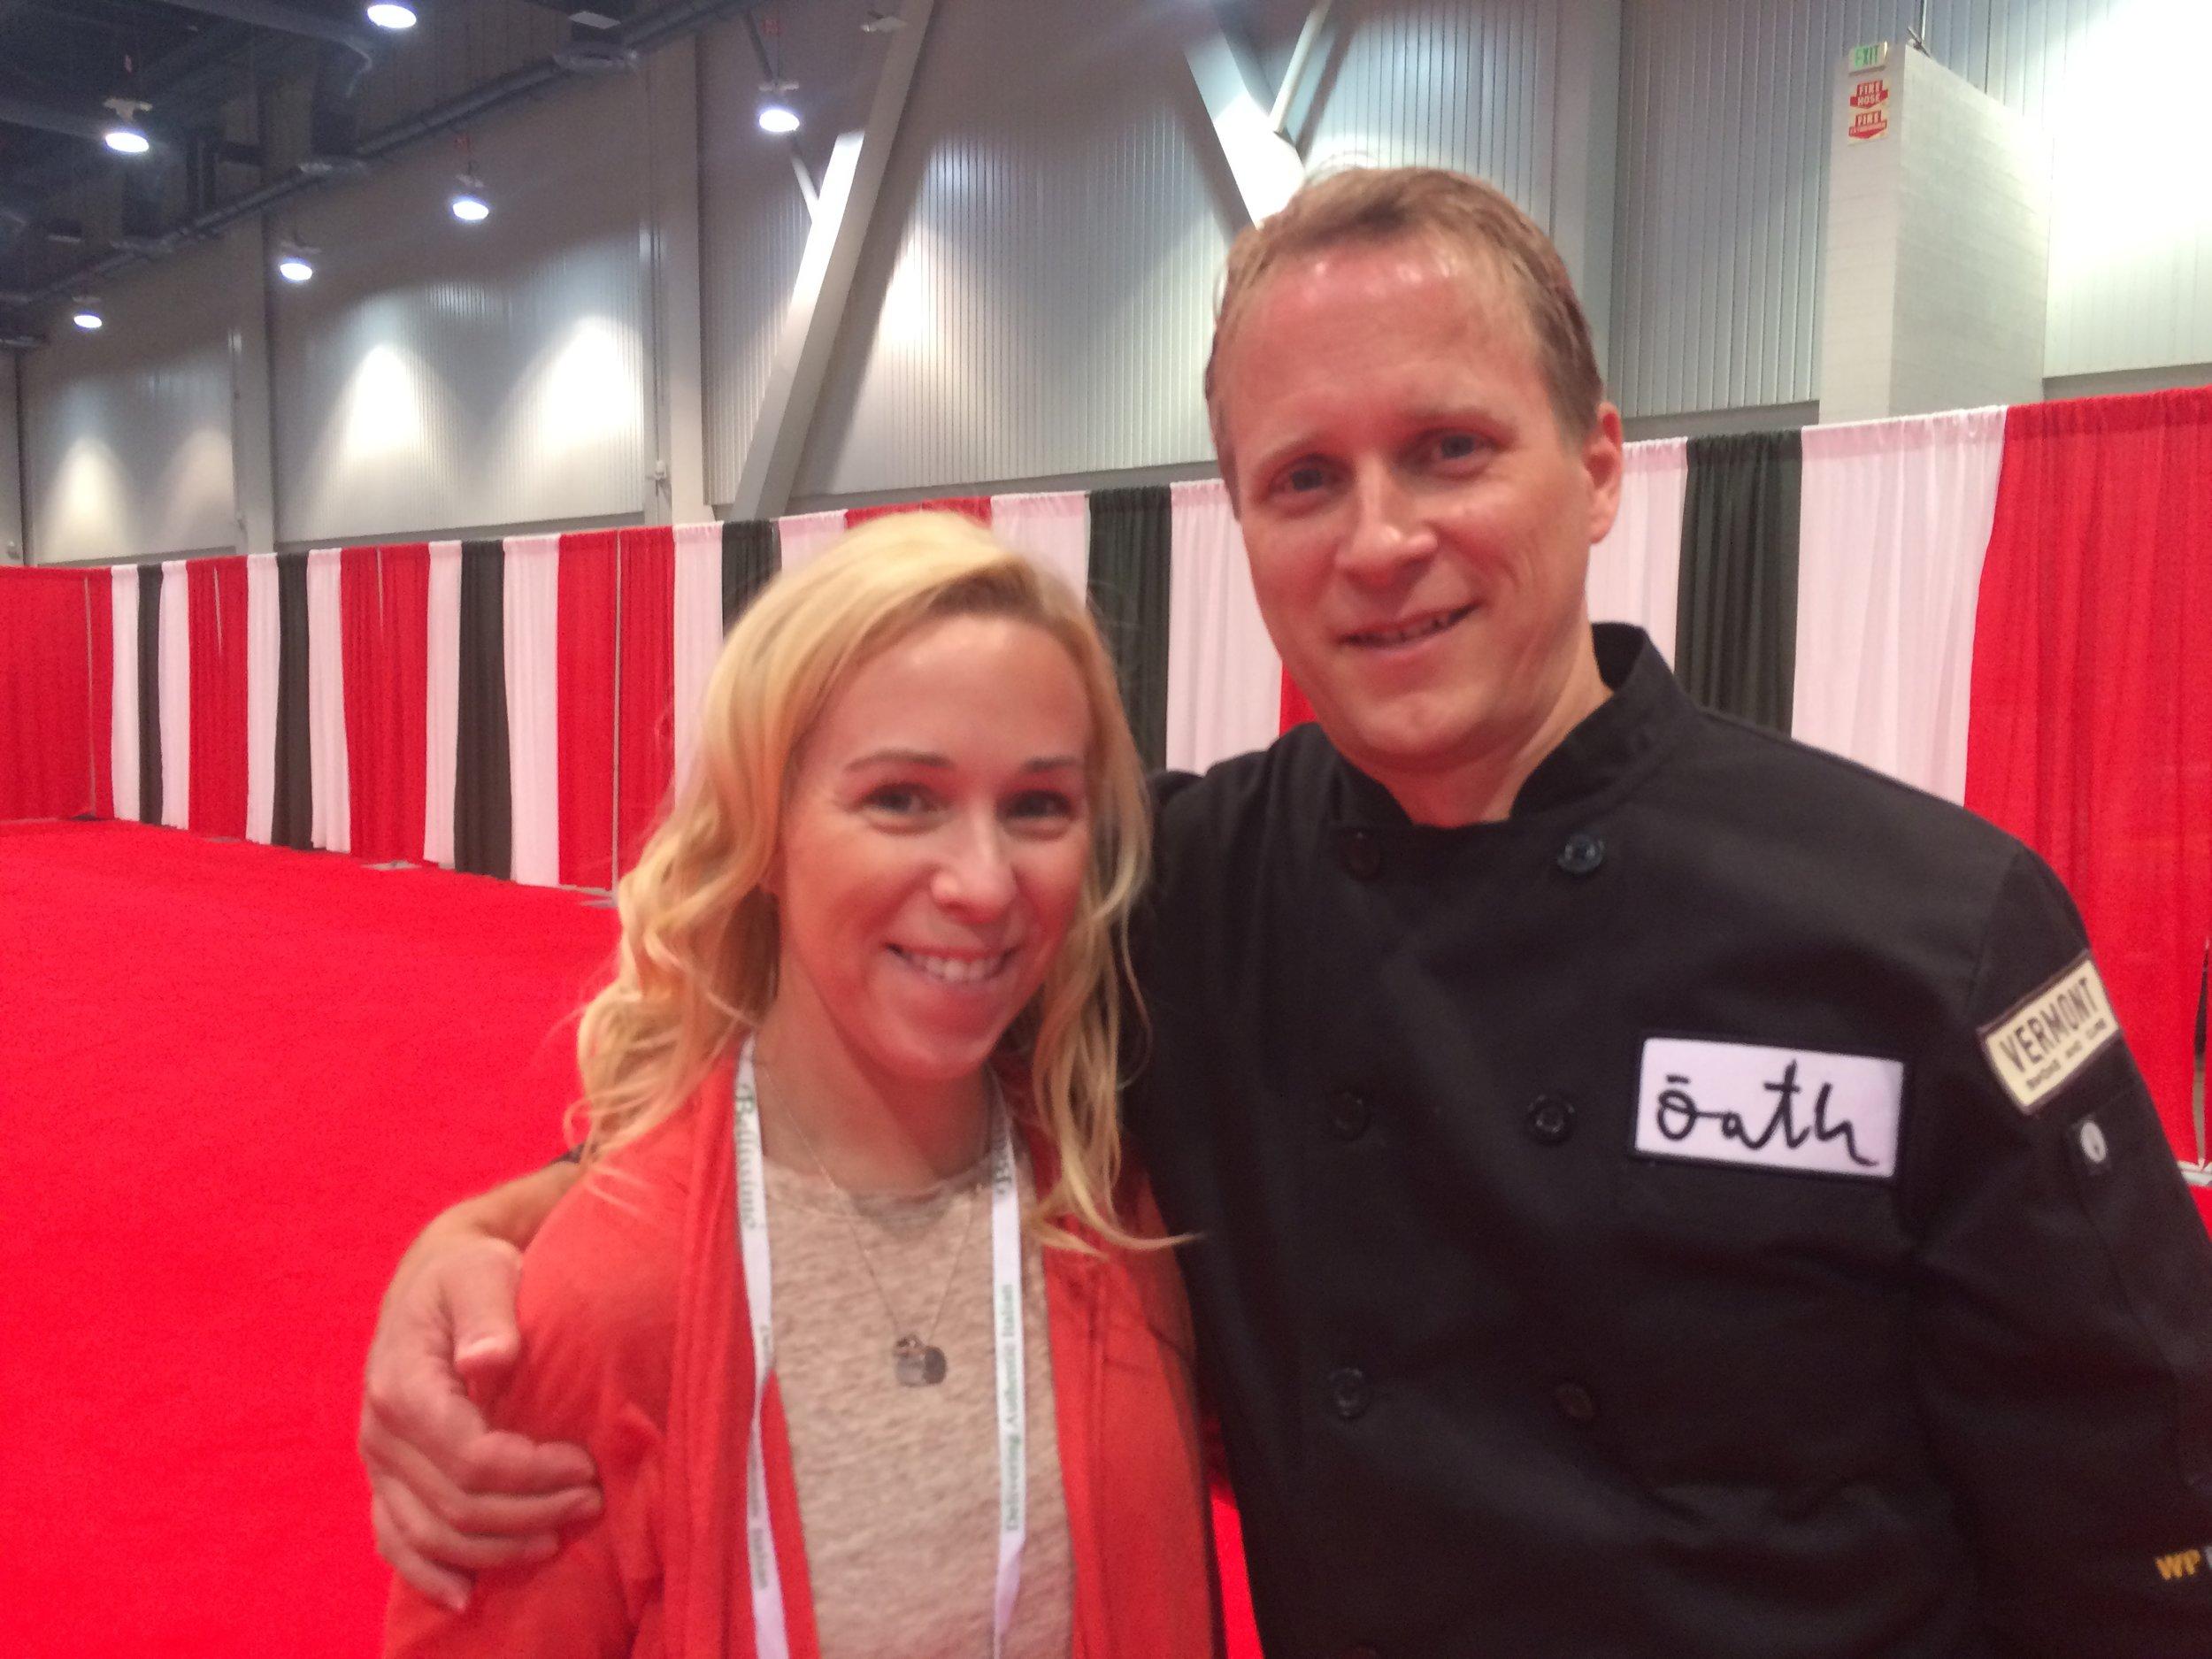 Melissa & Doug Ferriman, Pizza Visionaries